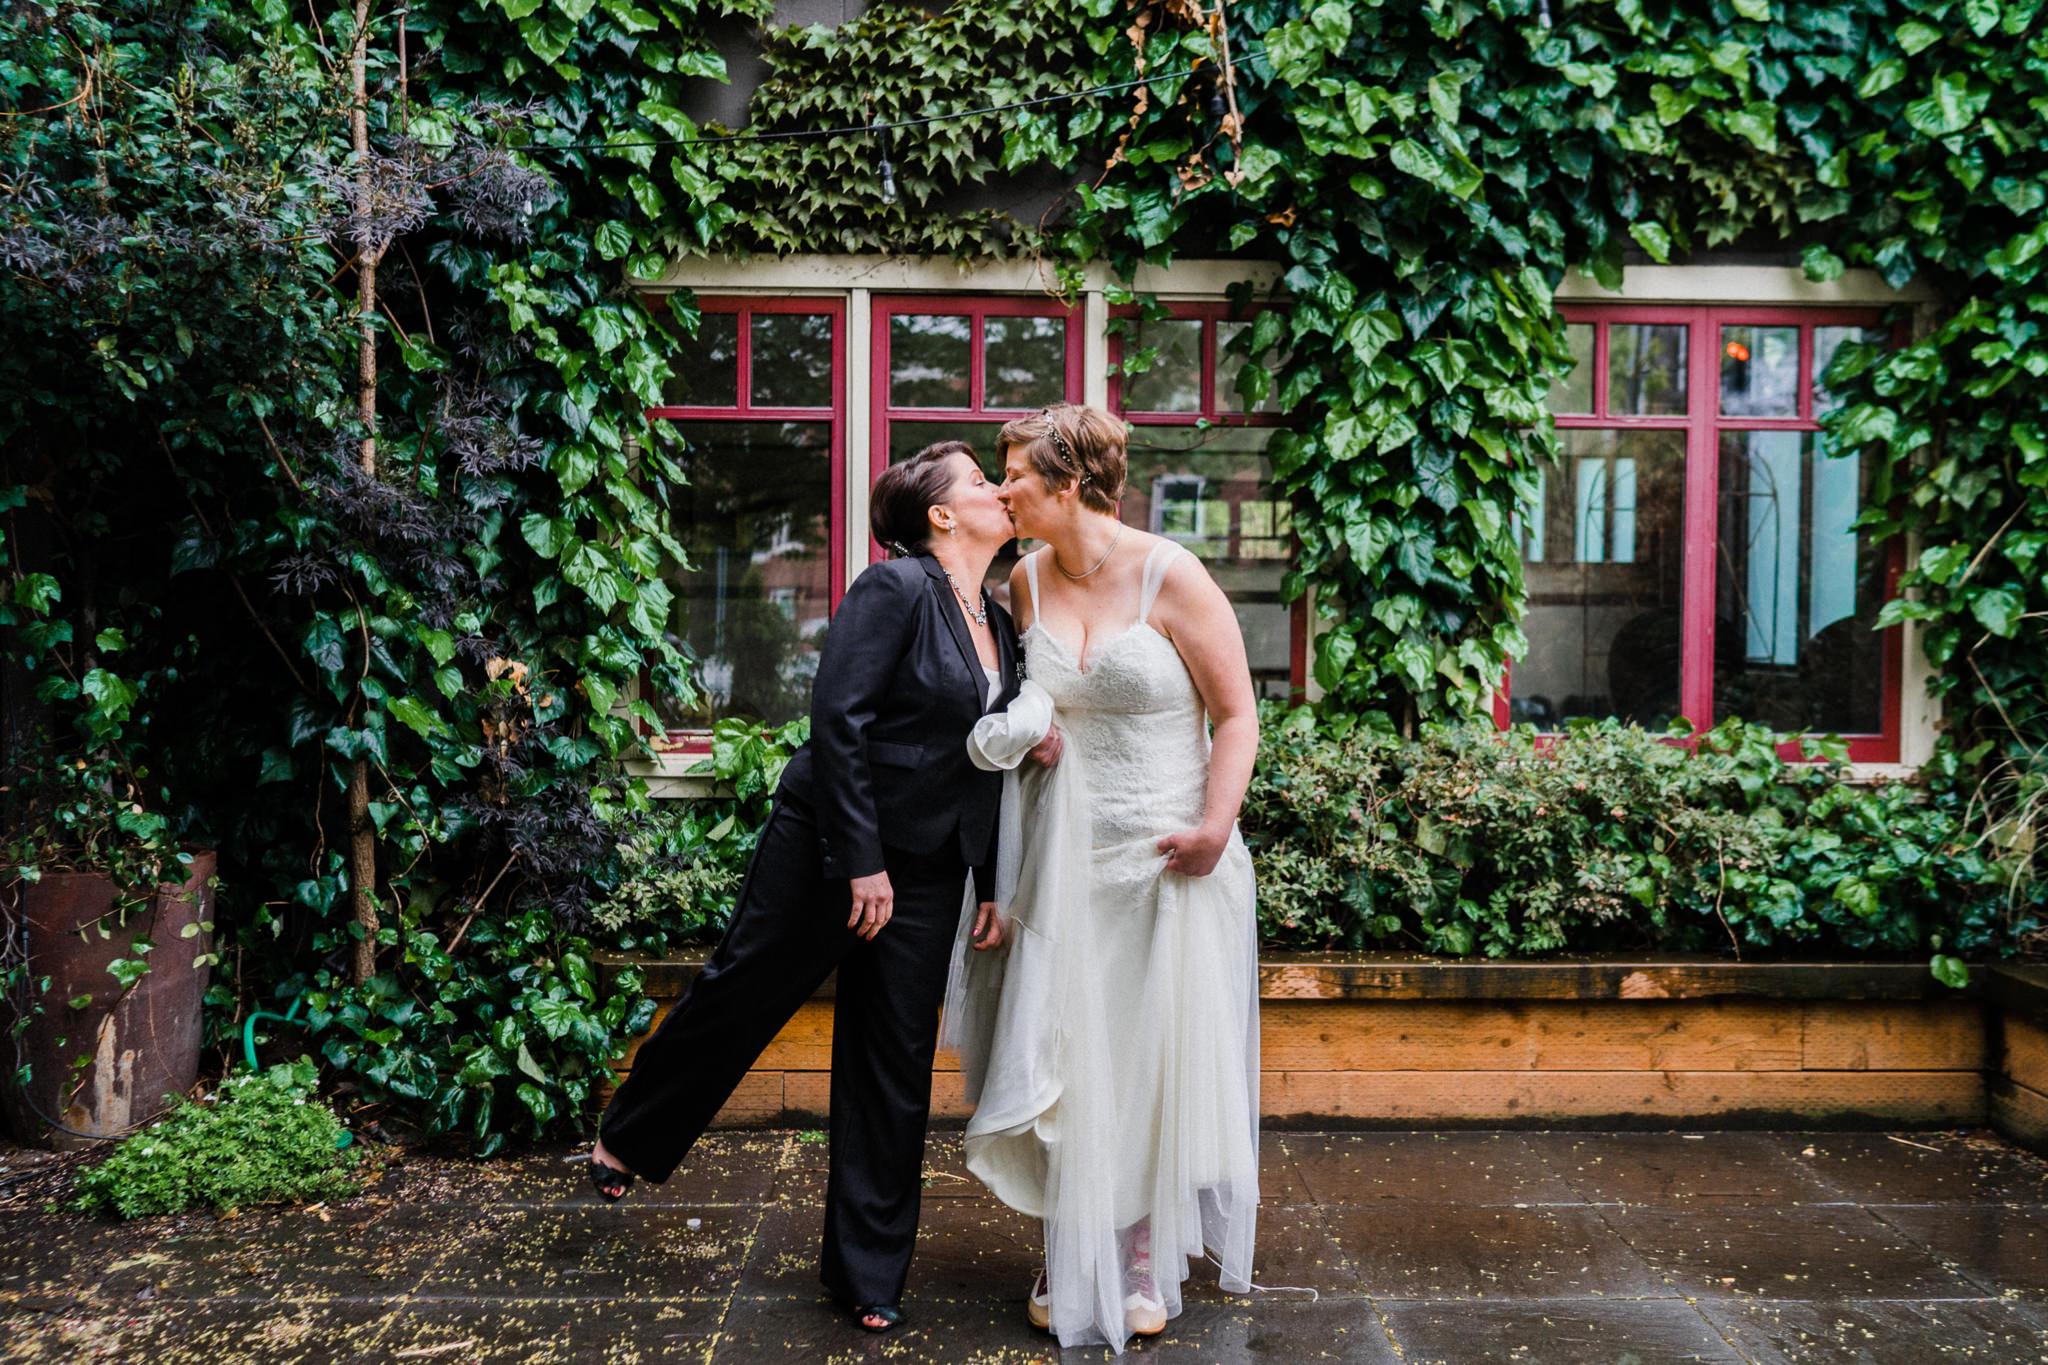 Kissing brides Green Ivy Window wall